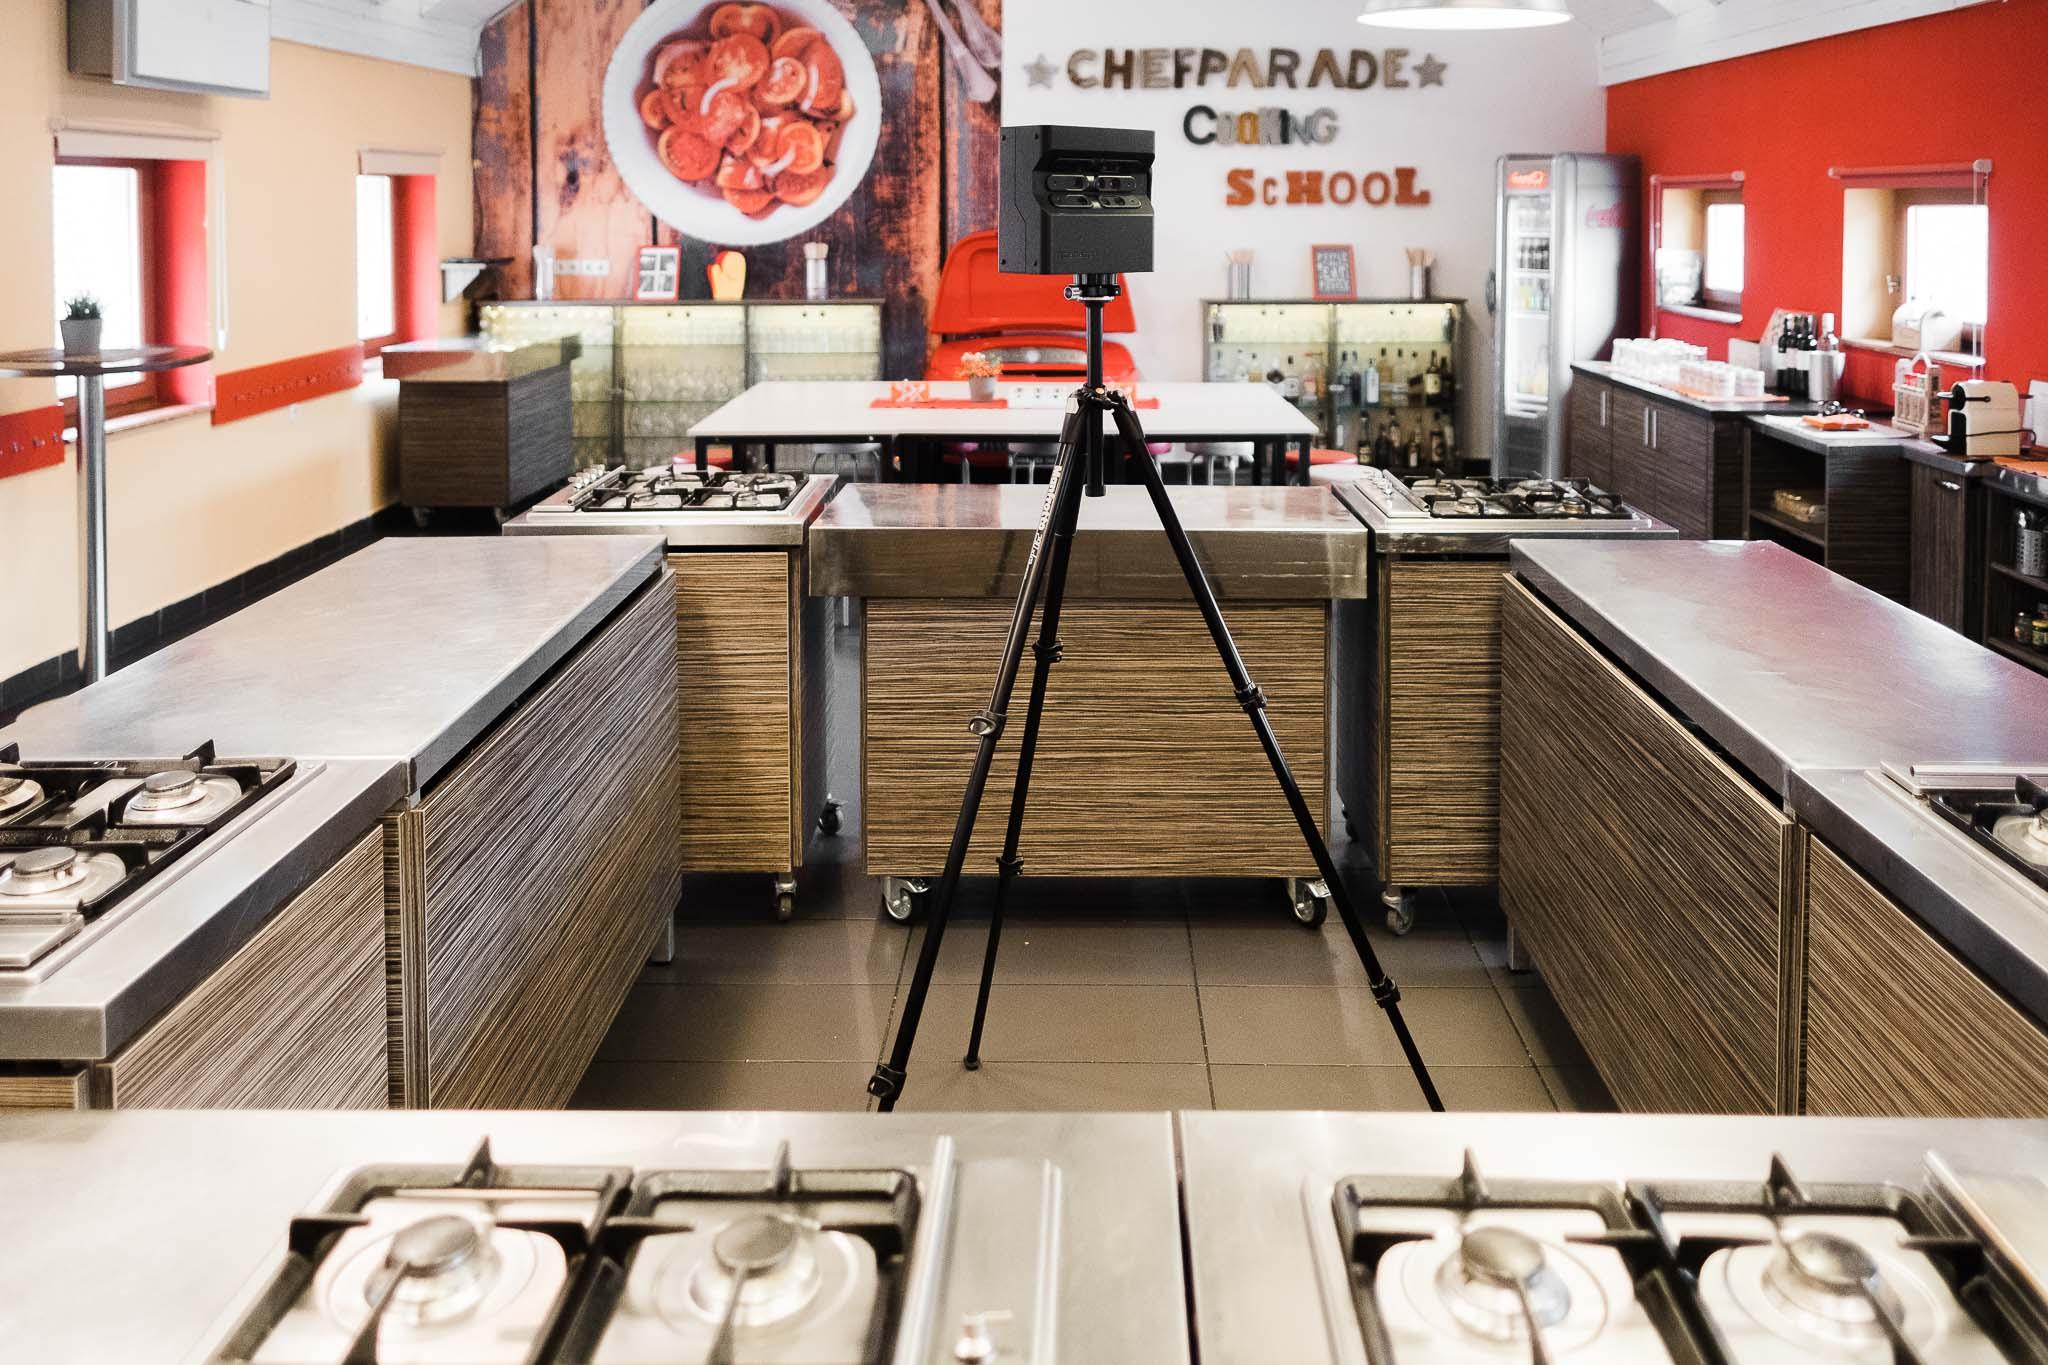 3D Virtuális Séta Sikersztorik Chefparade Bécsi